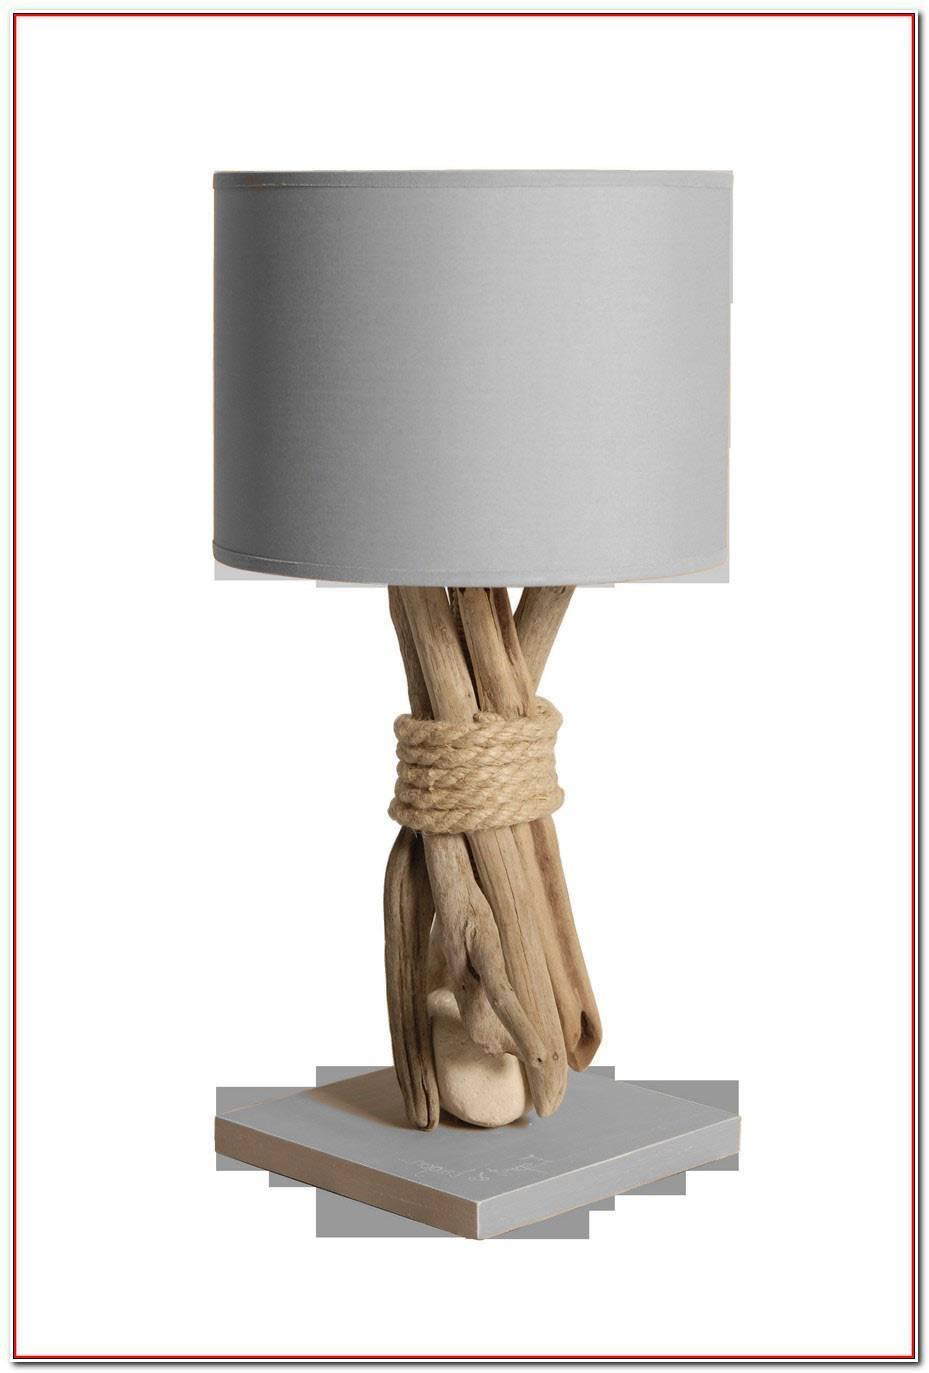 Lampe à Poser Conforama